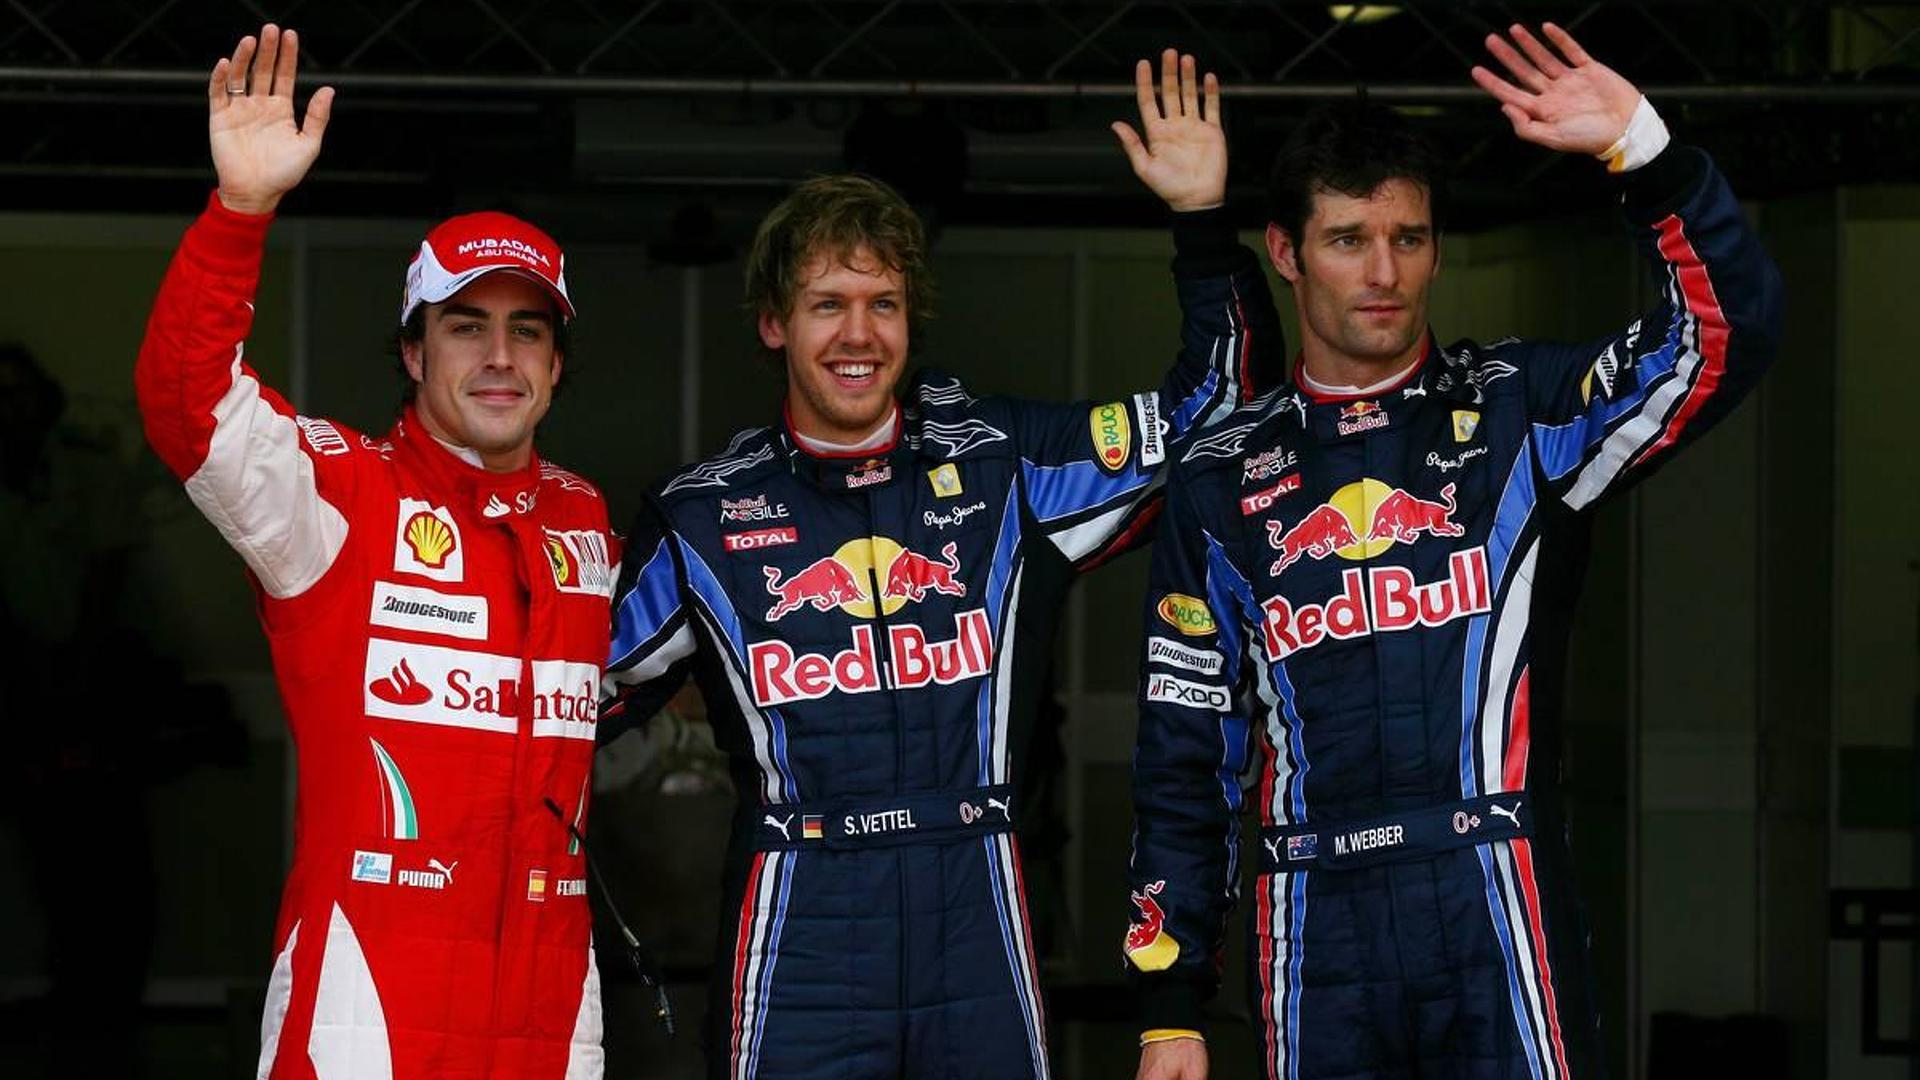 2010 British Grand Prix QUALIFYING - RESULTS